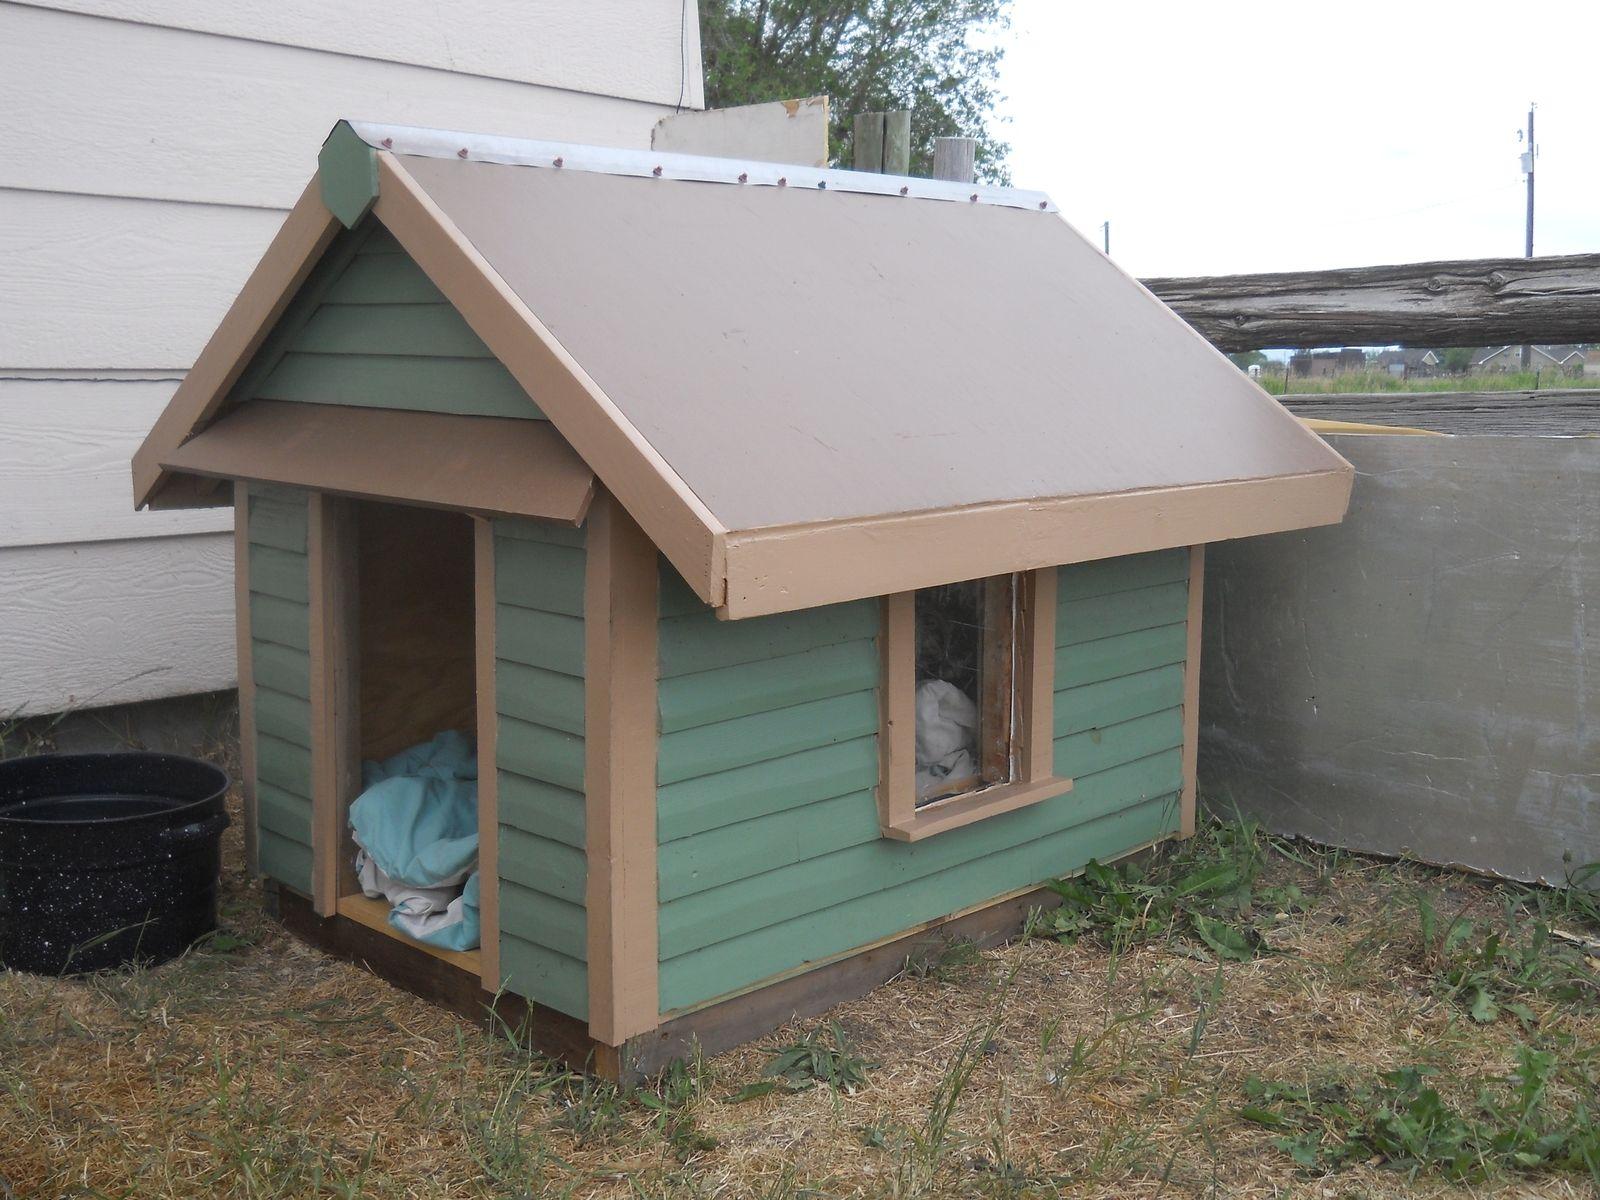 Handmade The Dog House By Cyndel O D P E R Elkhorn